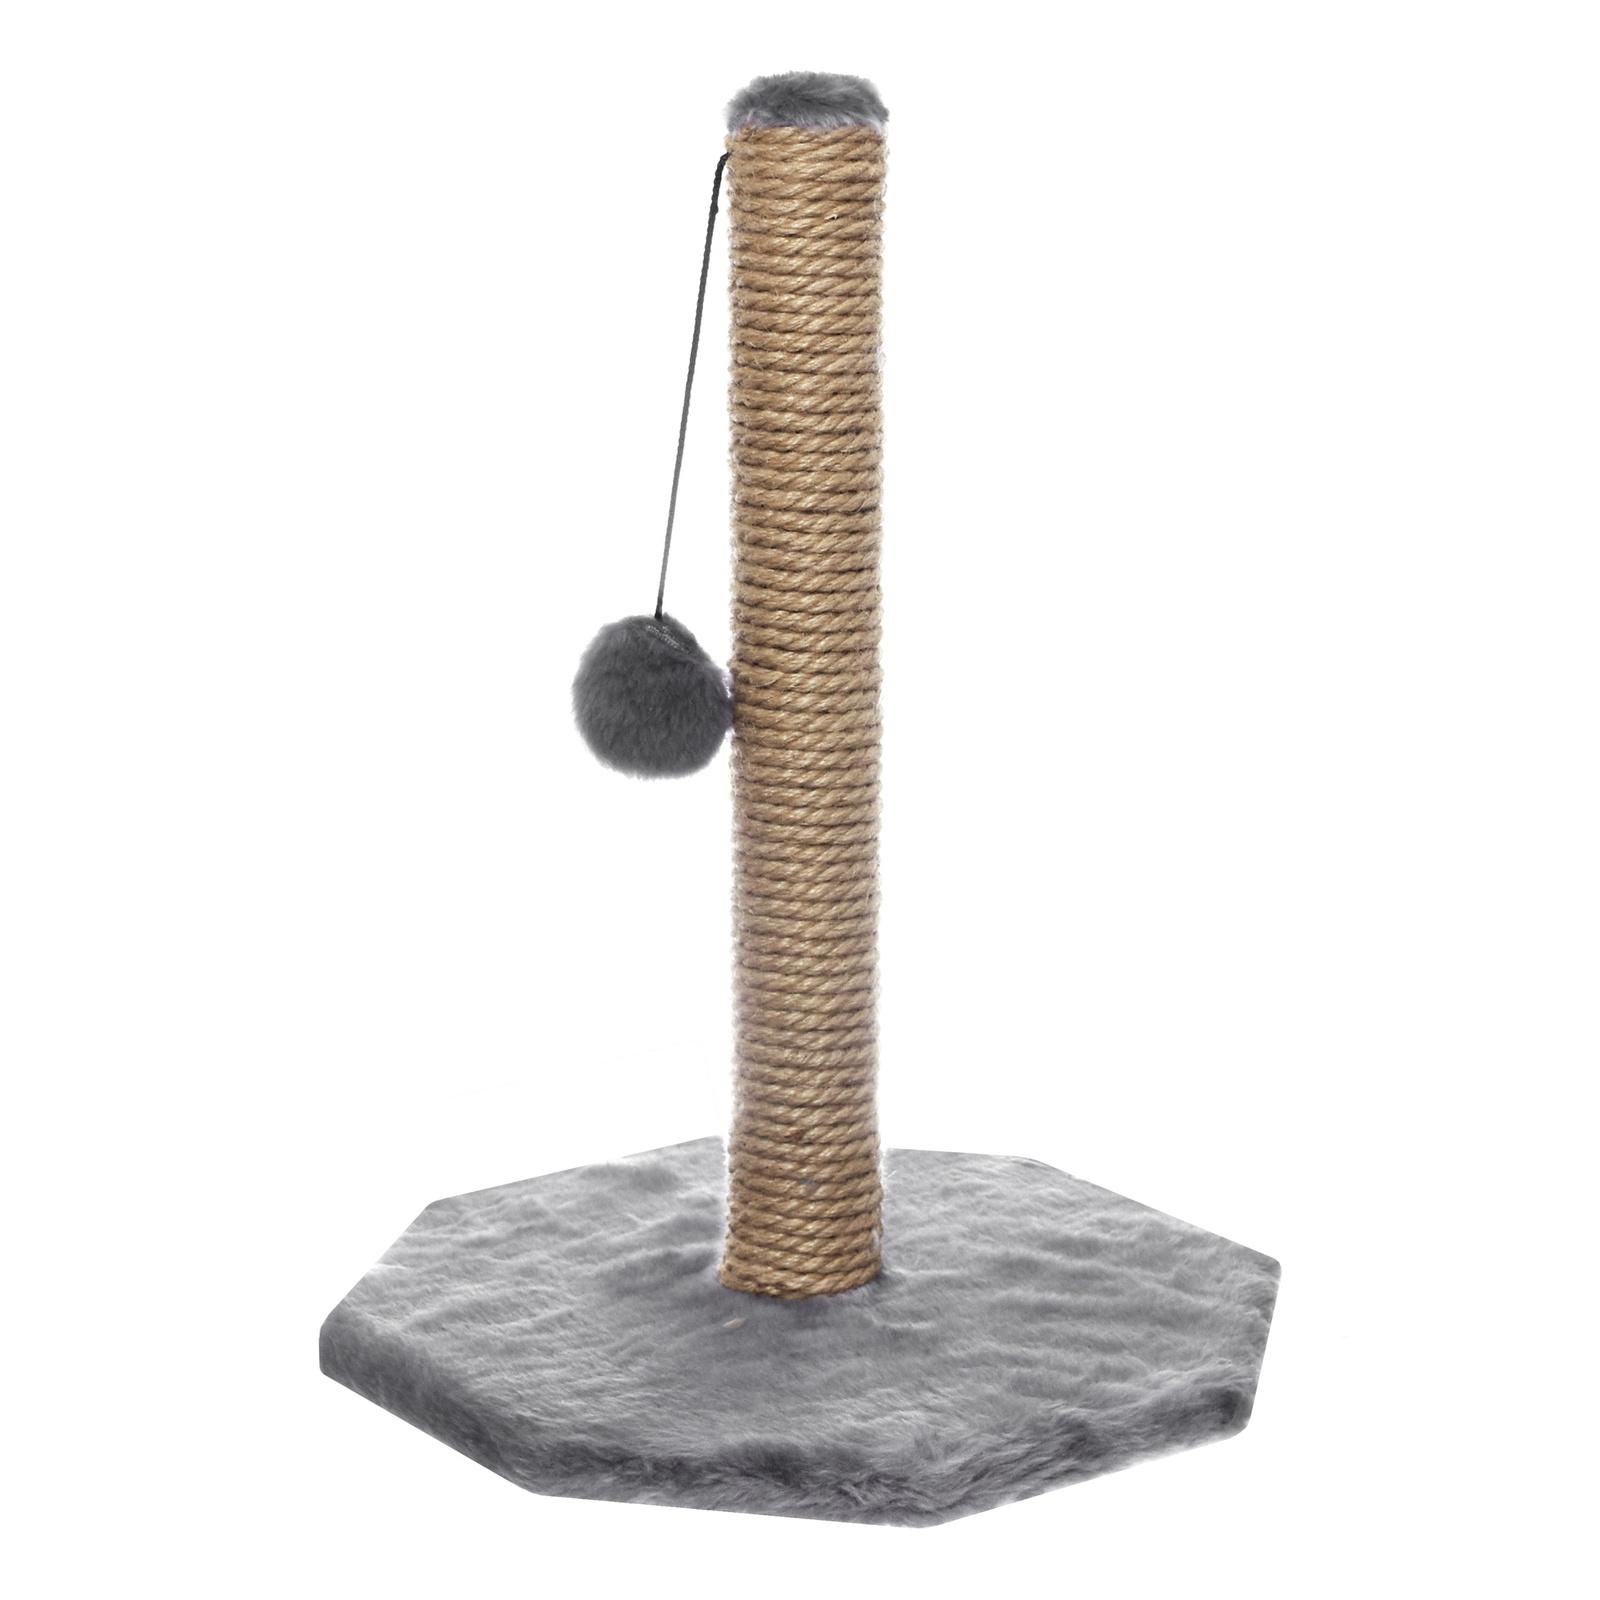 Yami-Yami Yami-Yami когтеточка Столбик 48 см с помпоном, джут, основание 36x34 см (тёмно-серый) yami yami 1шт игрушка мячик пластмассовый для кошек 3 5см 2400 0 007 кг 2 шт